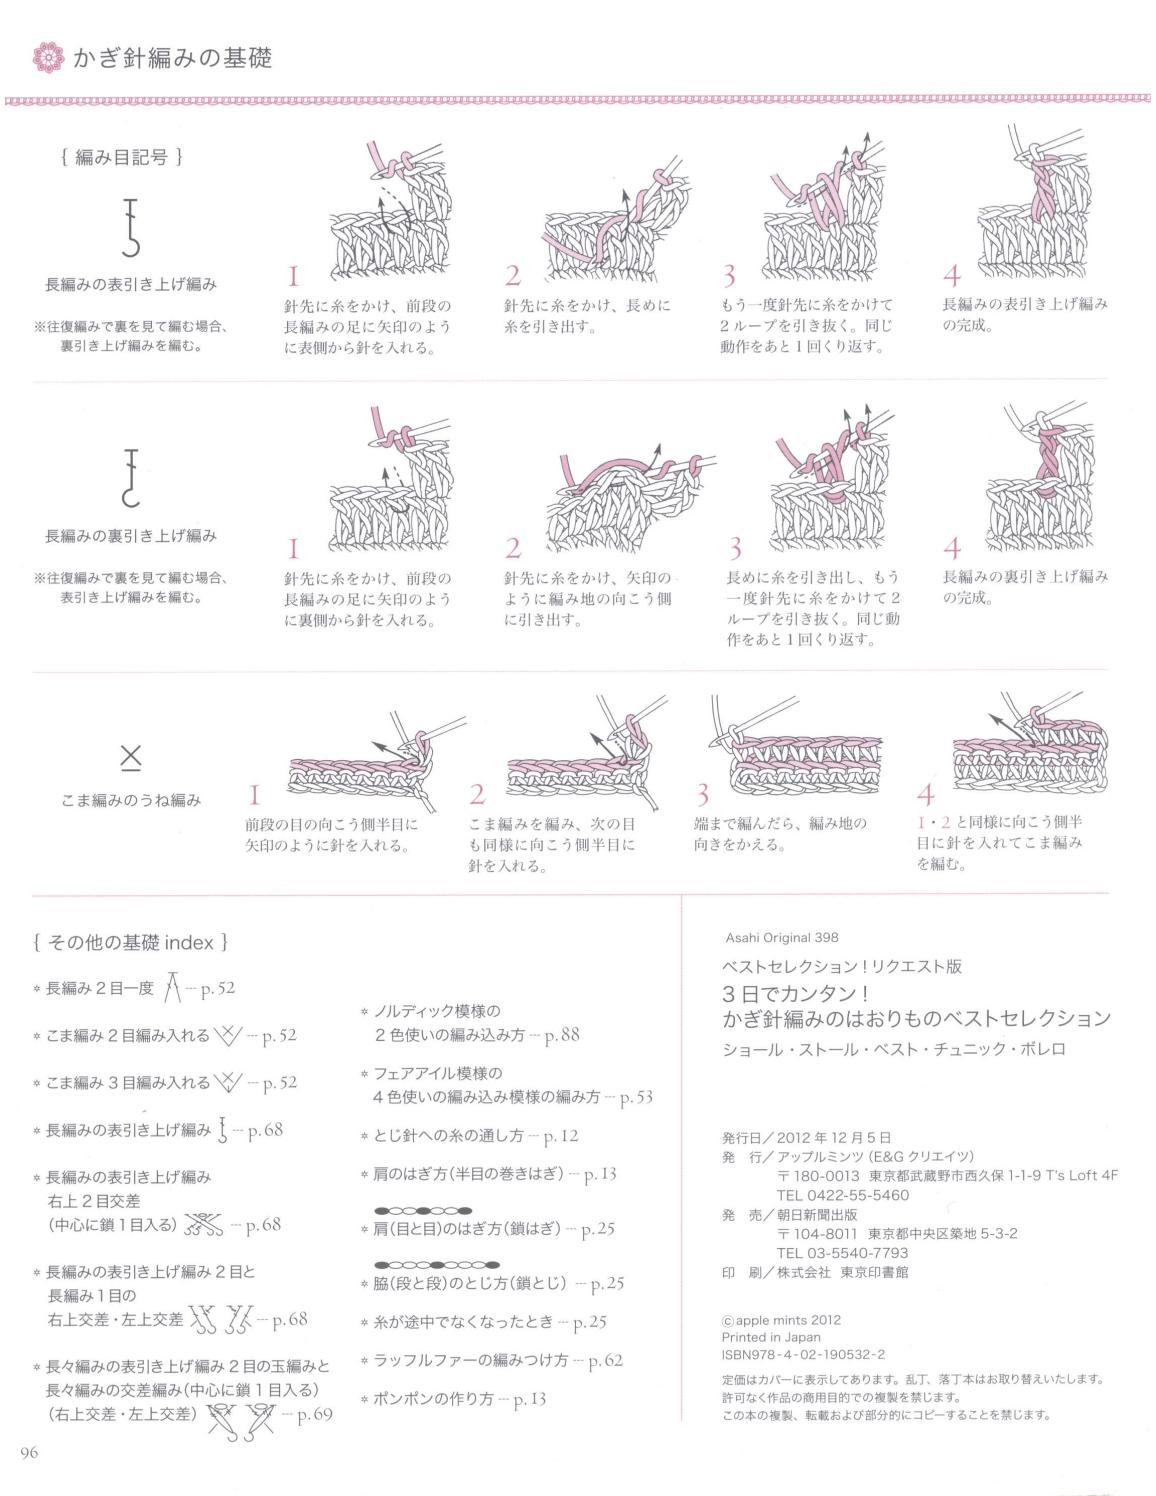 Asahi original crochet best selection 2012 page 96